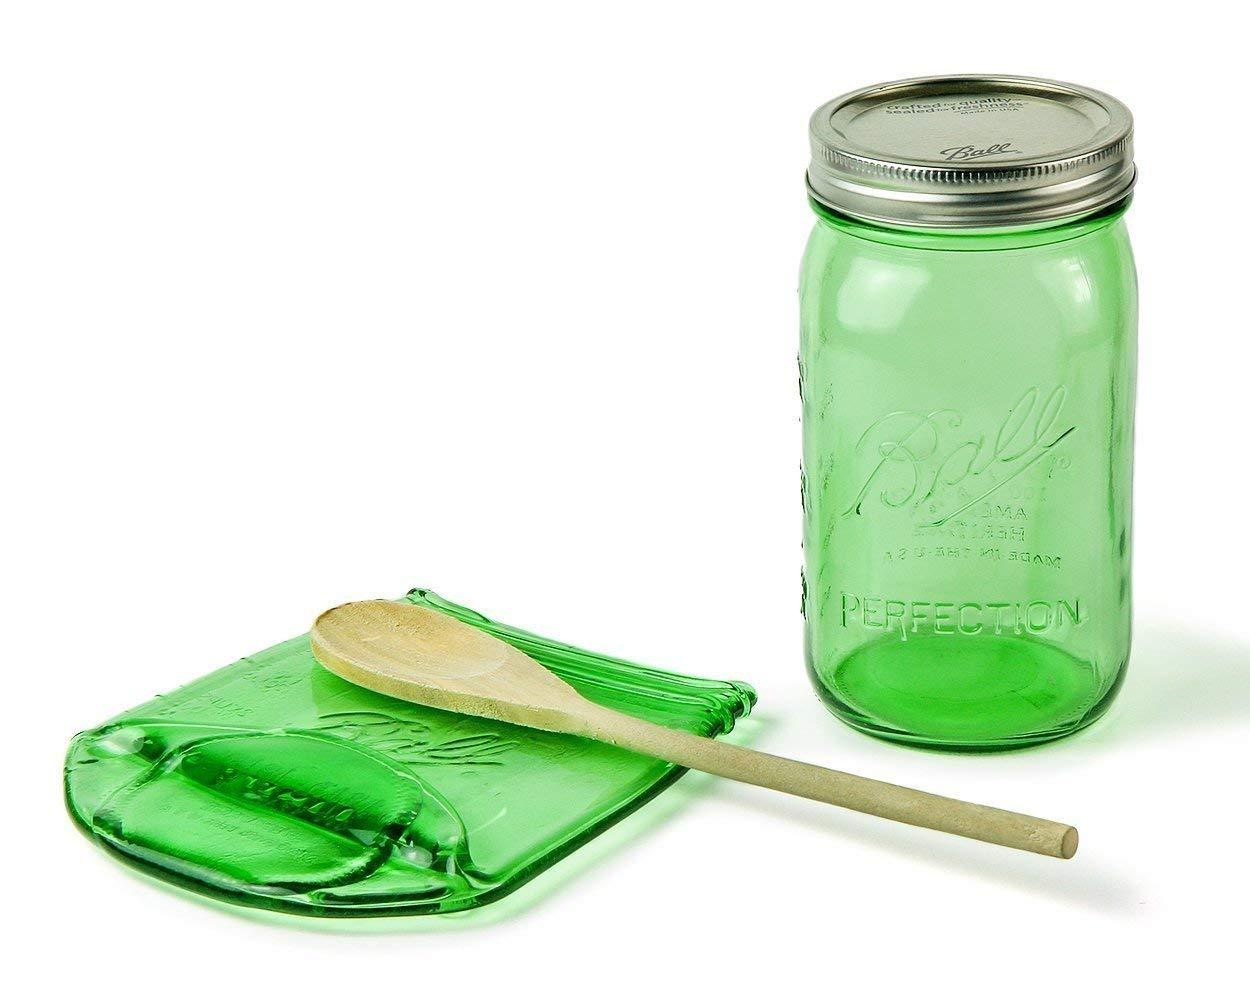 Large Green Melted Mason Jar Spoon Rest, Vintage Style Ball Jar